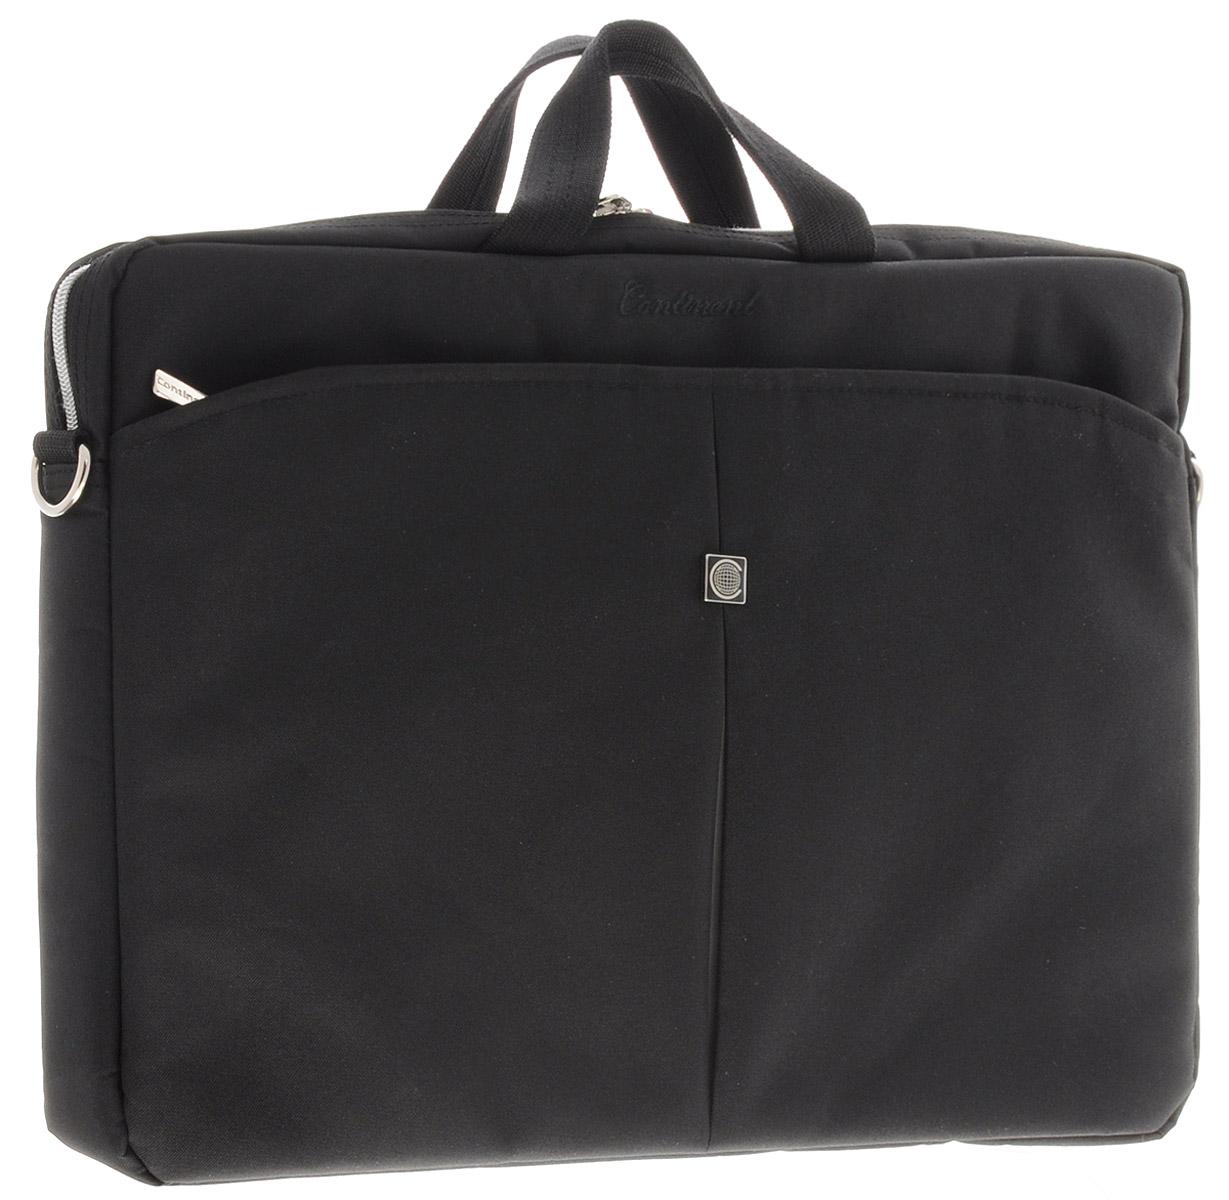 Continent CC-01, Black Silver сумка для ноутбука 15,6